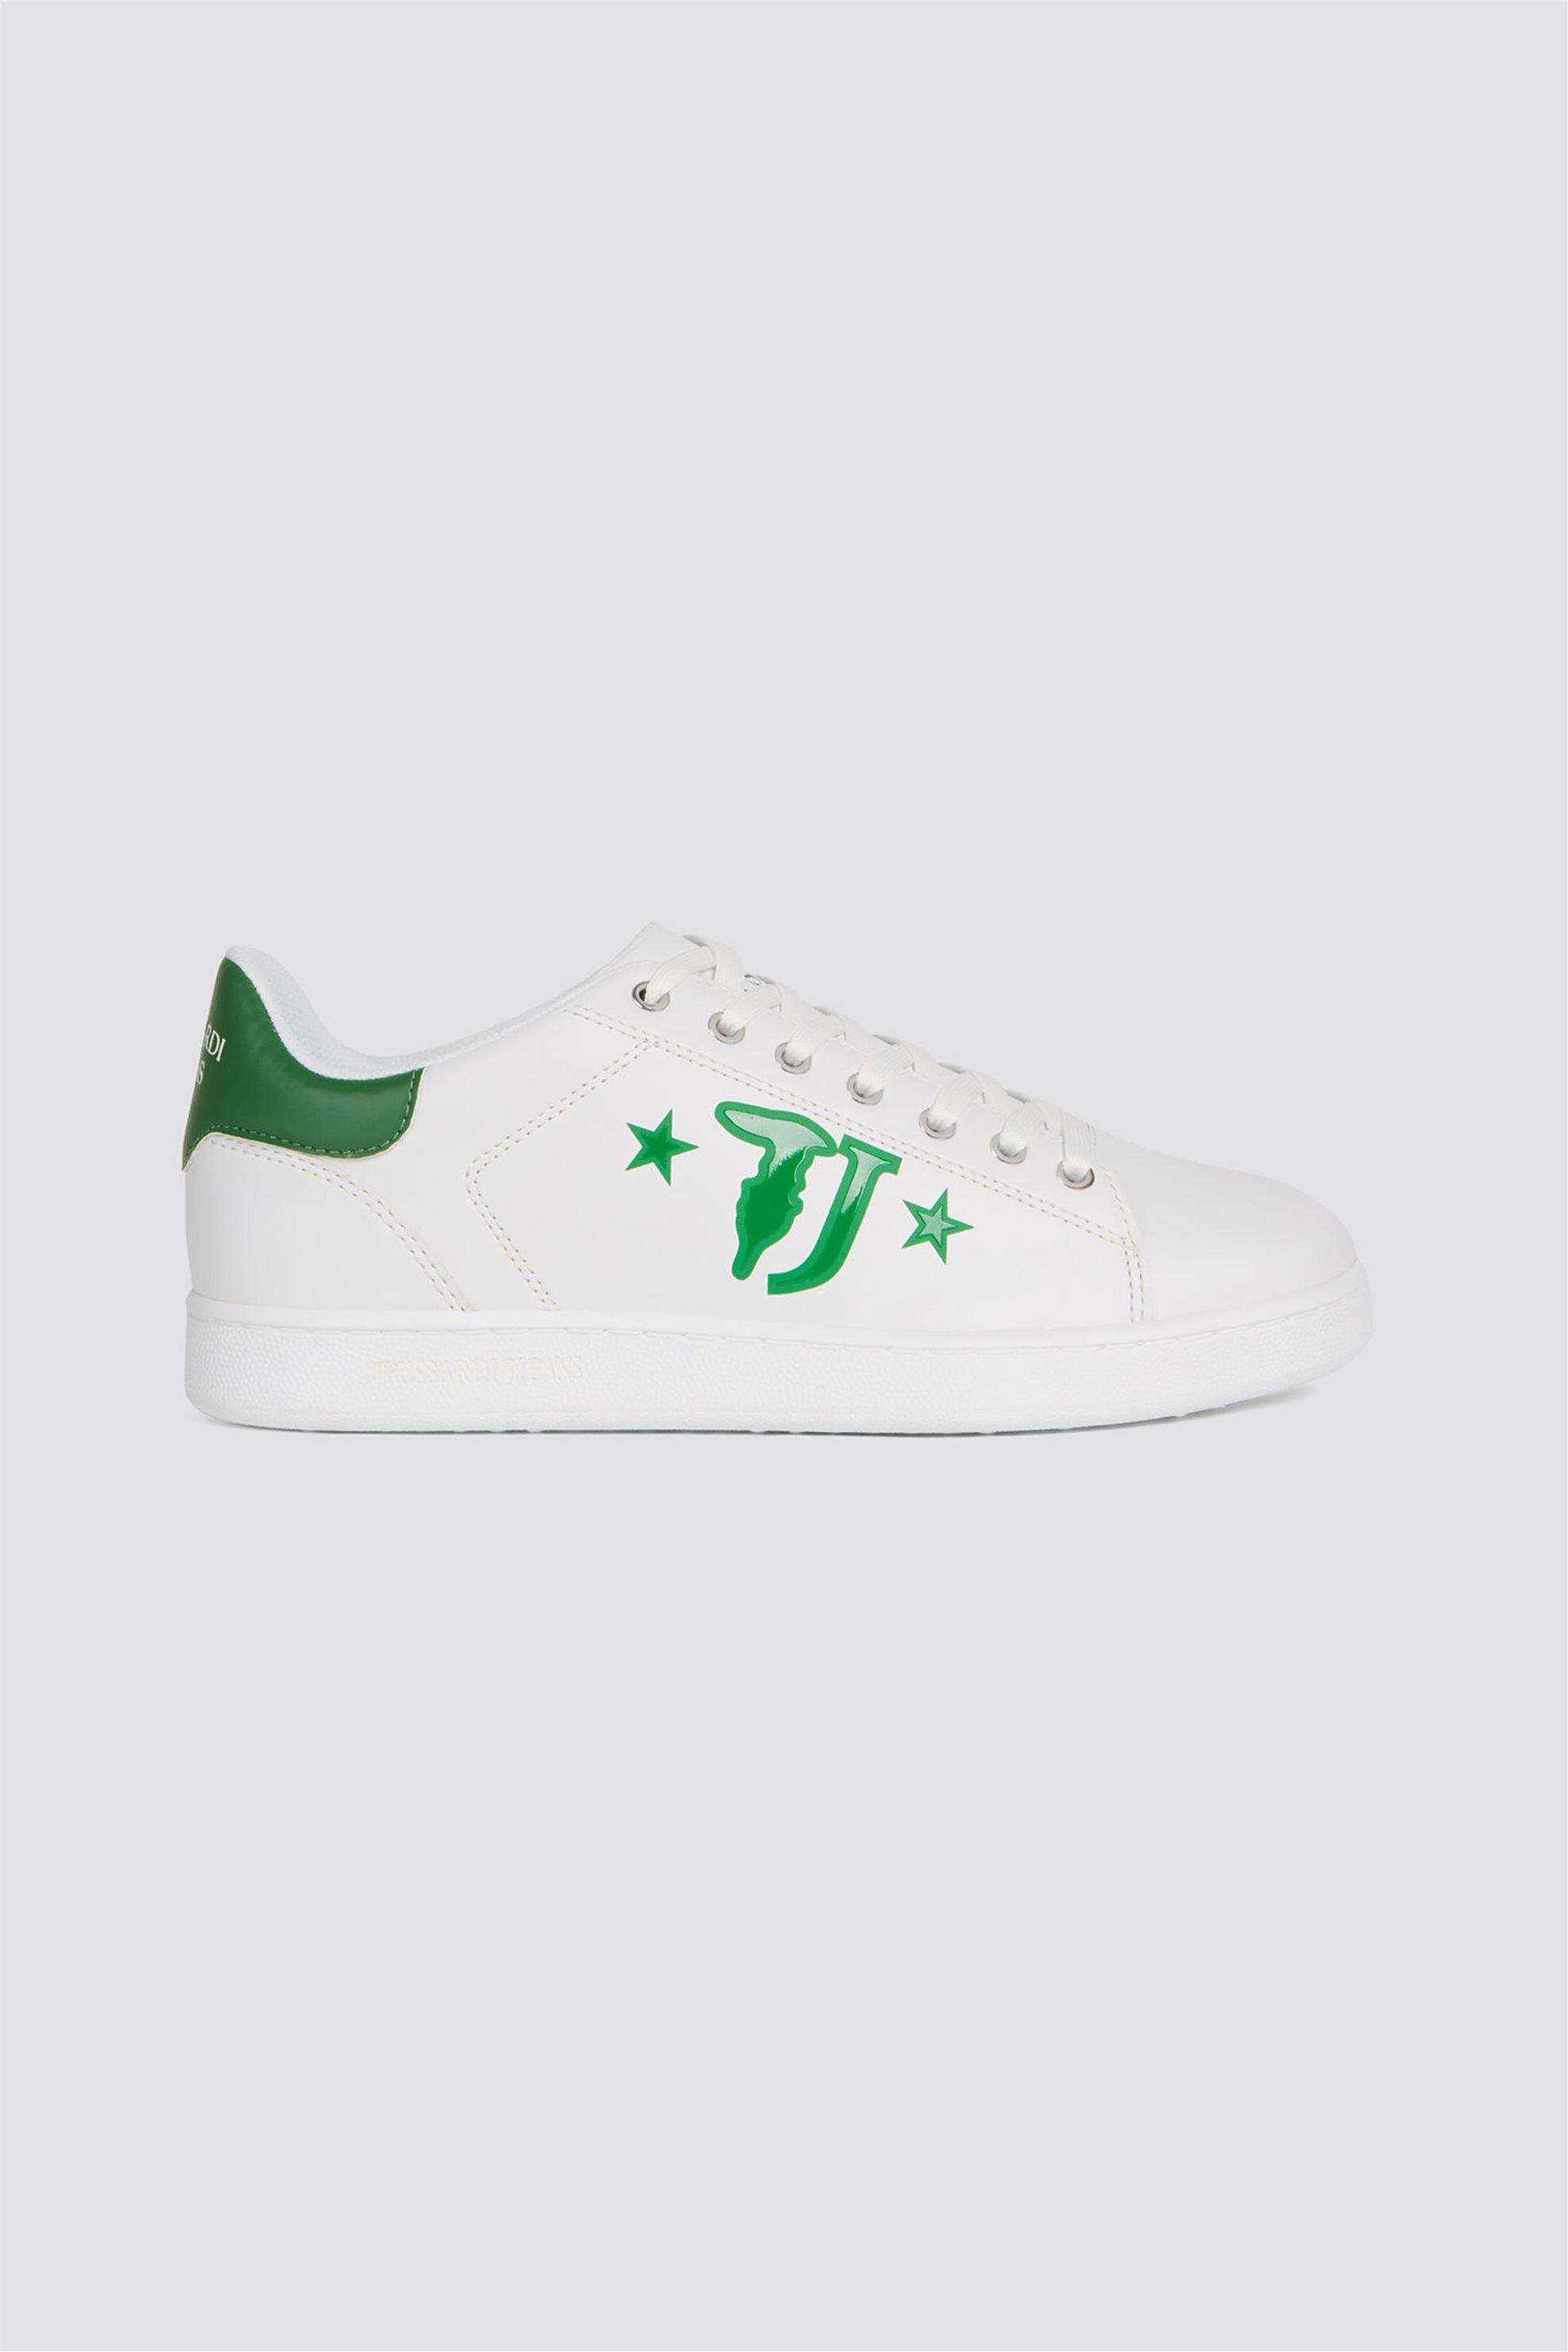 Trussardi ανδρικά sneakers με brand logo print στο πλάι – 77A00173-9Y099999 – Πράσινο